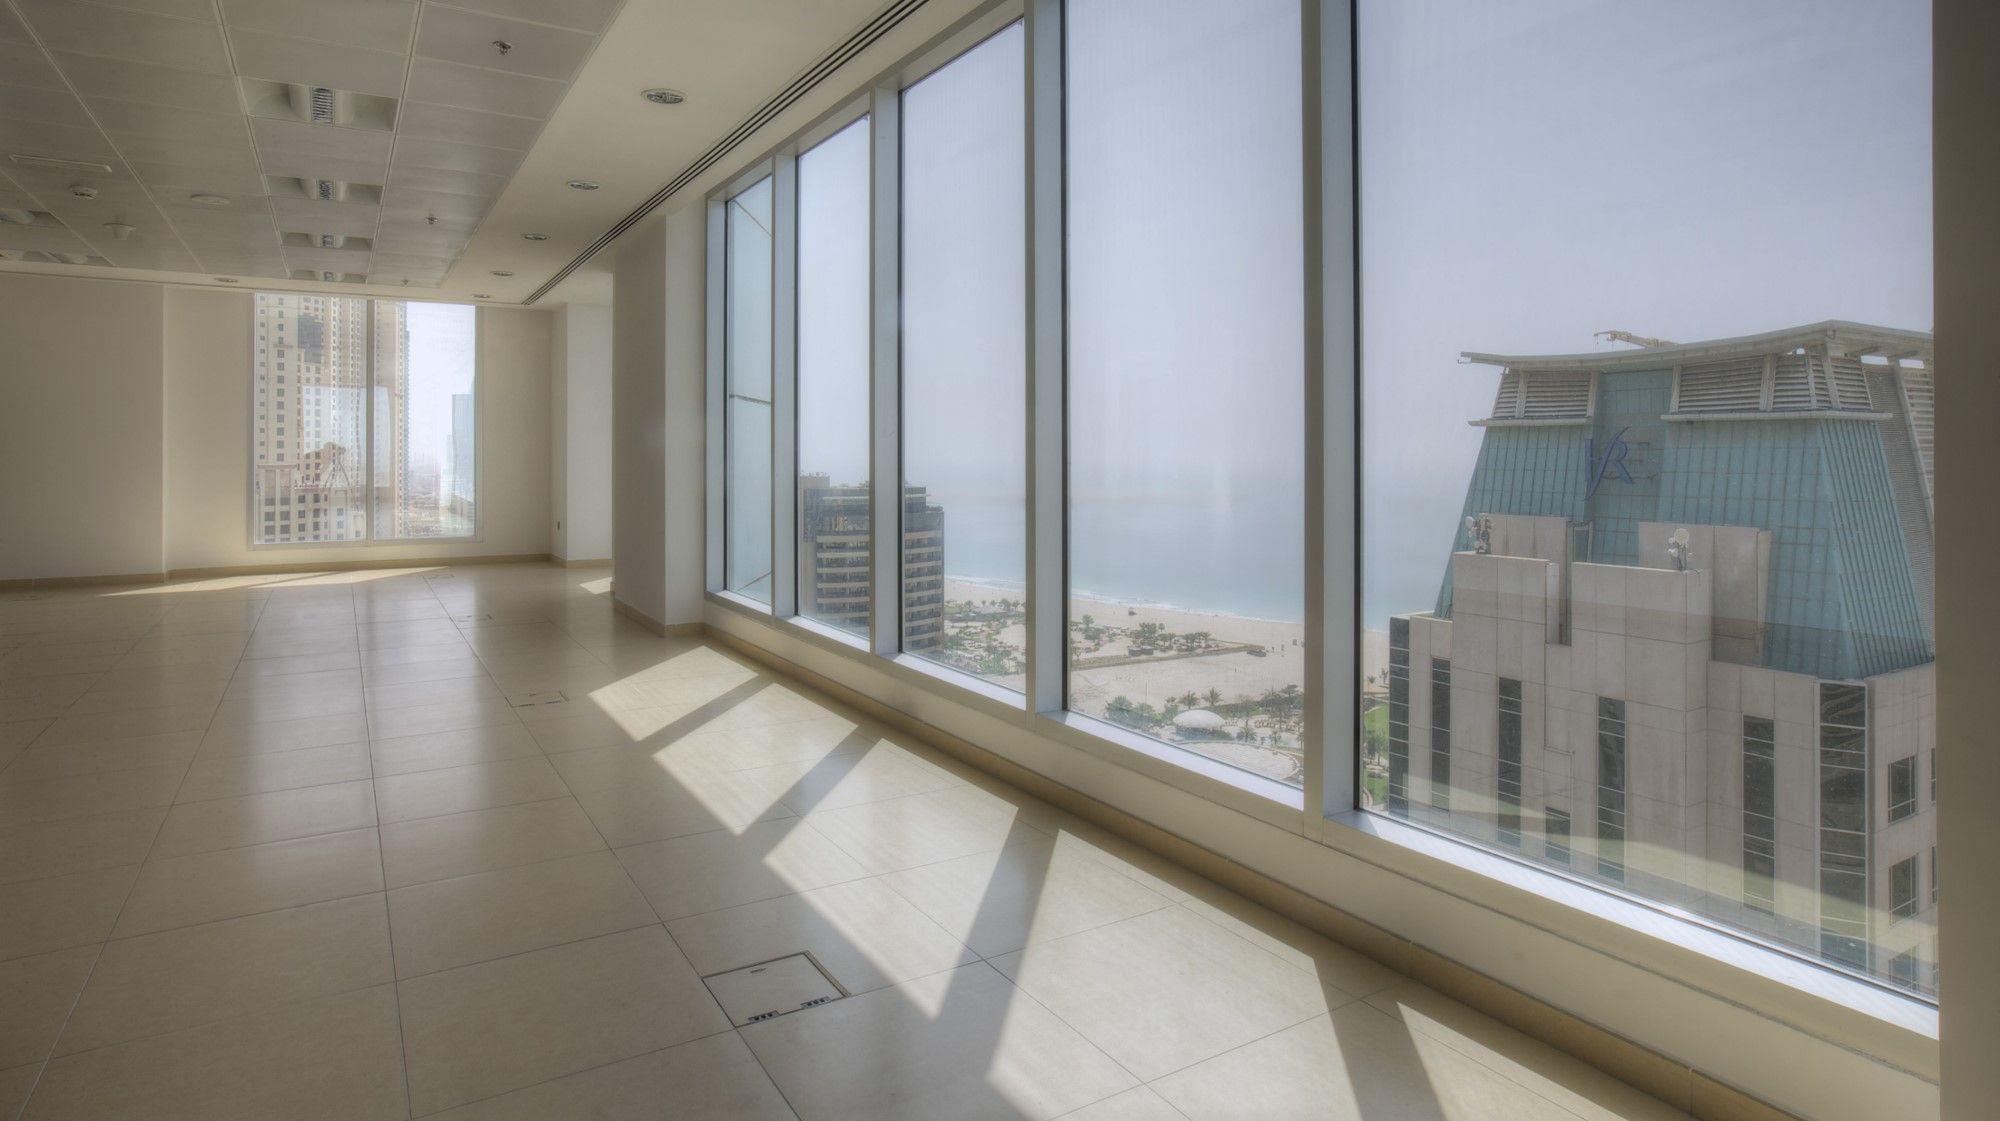 AHBT_Prime office space